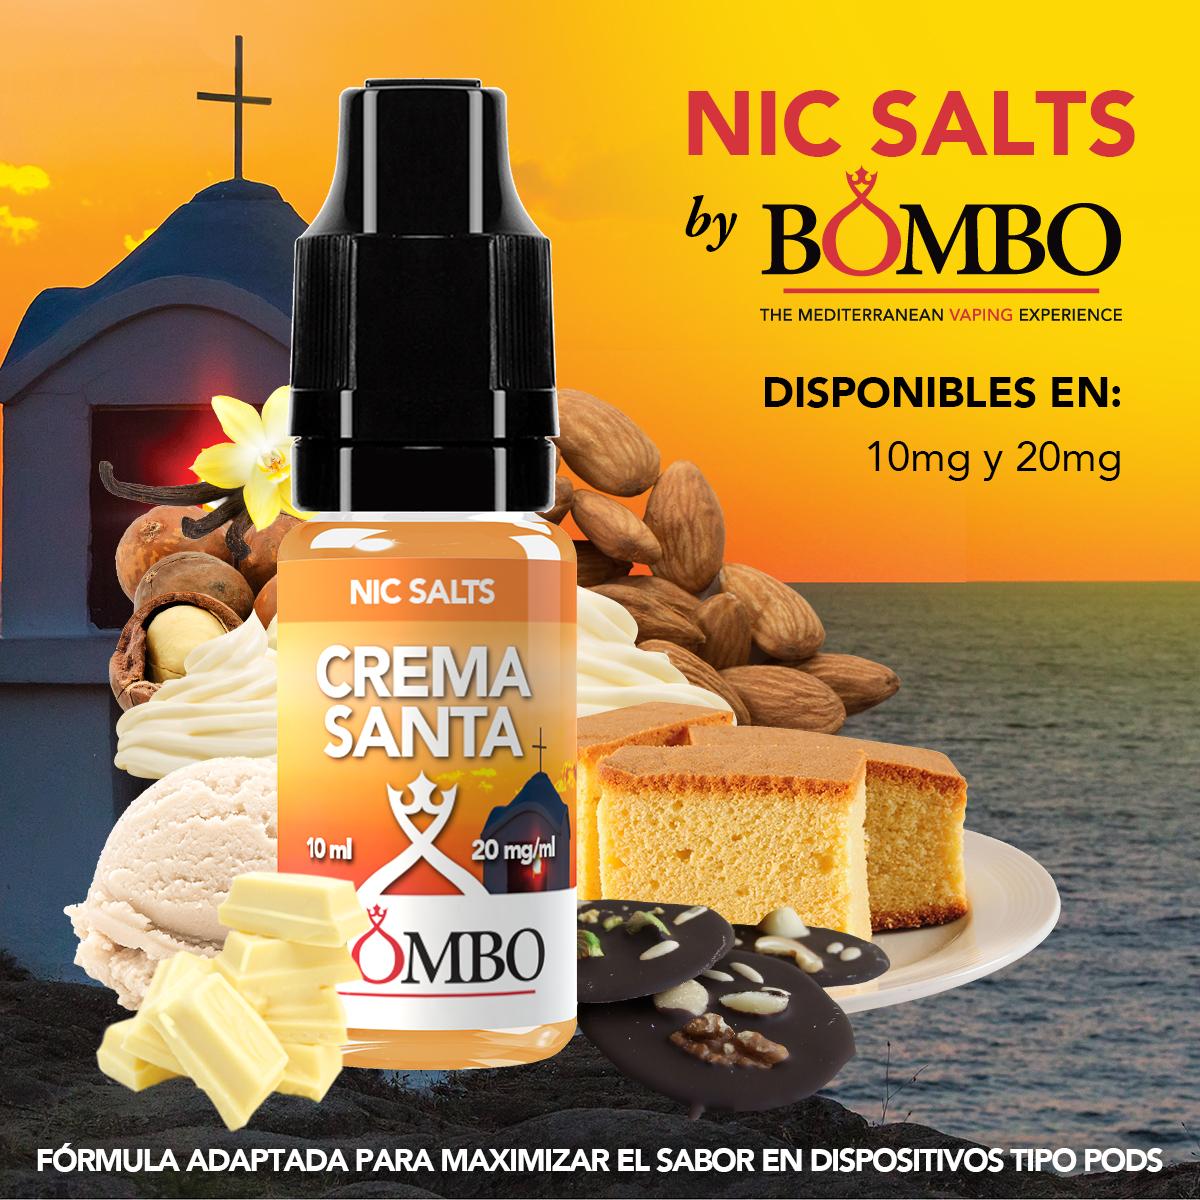 crema santa bombo eliquids nic salts sales de nicotina